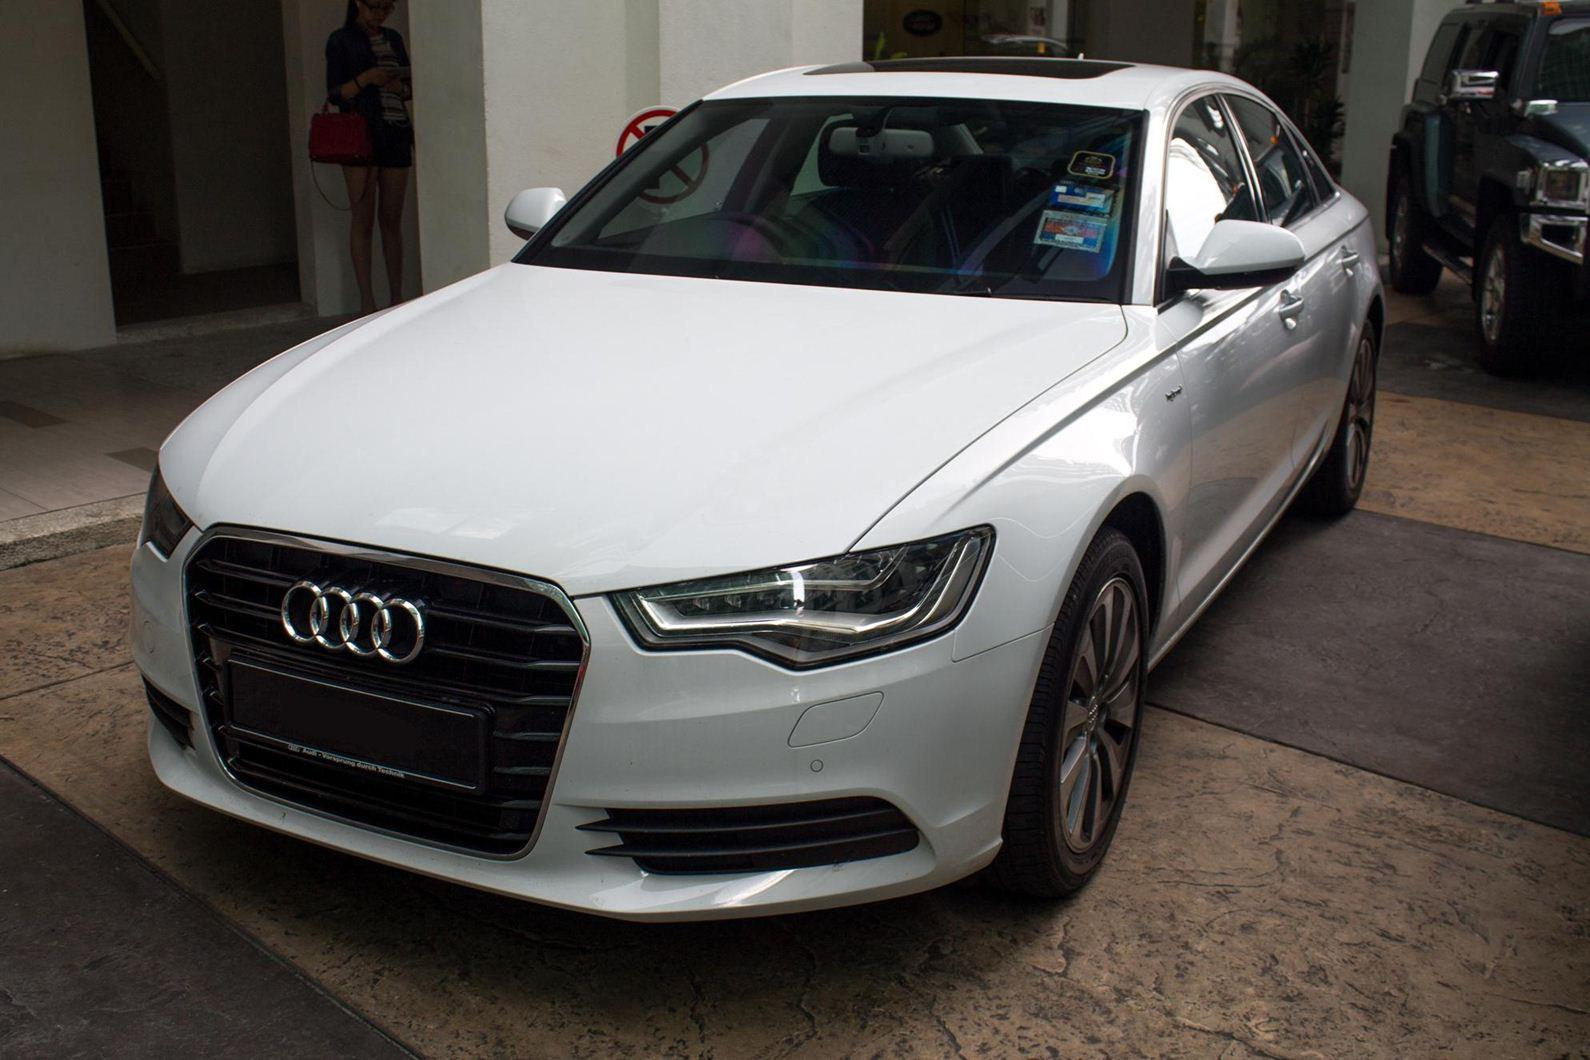 Audi A13 Car Rental Malaysia   Affordable Luxury Vehicle   audi car rental